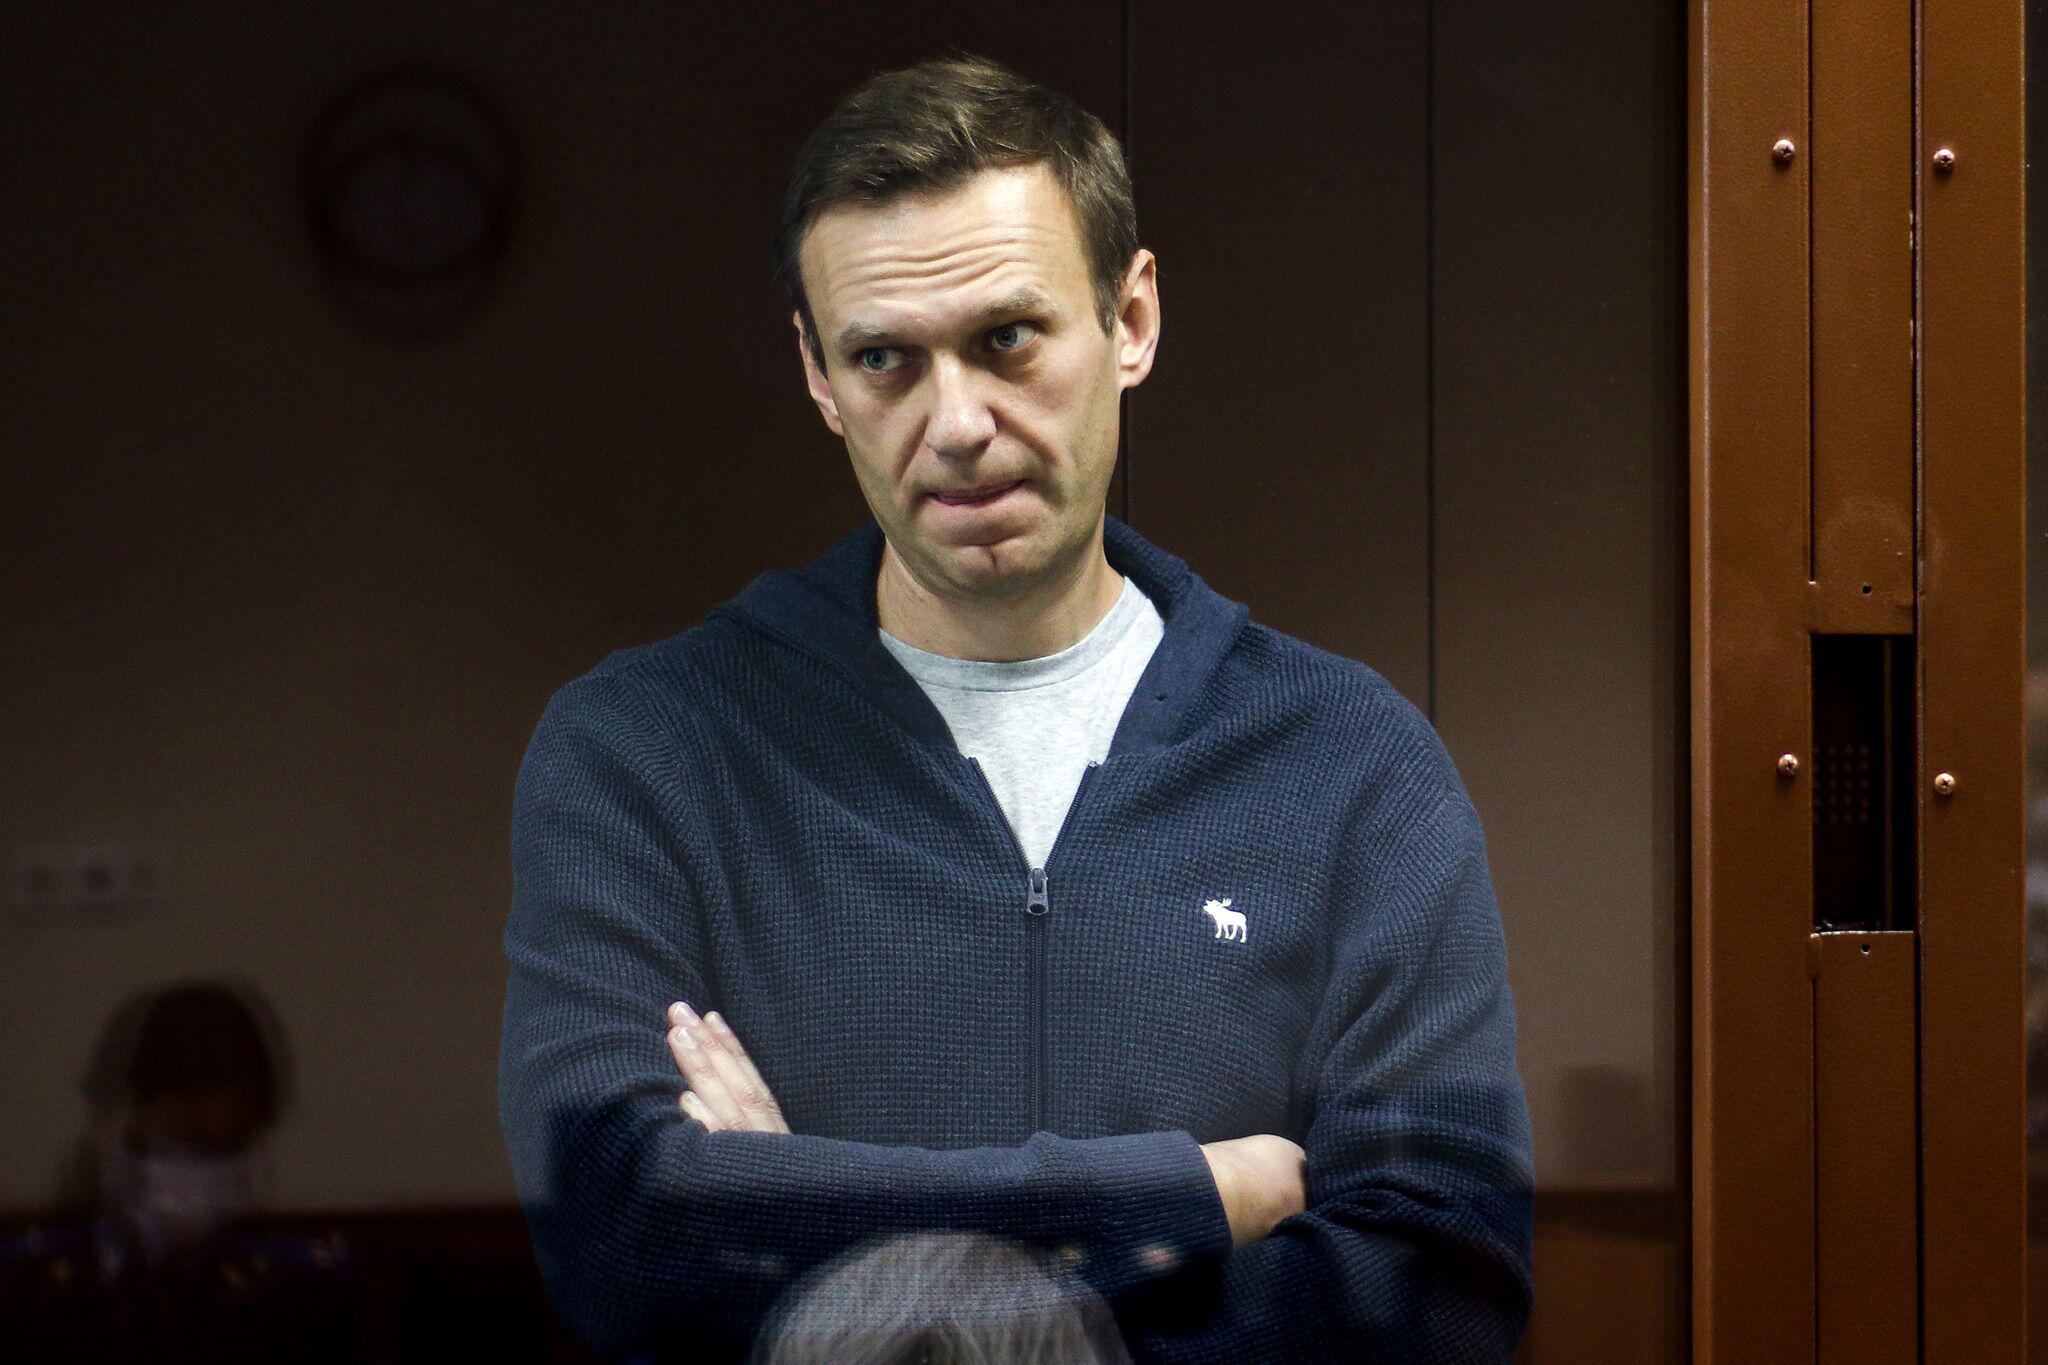 Bild zu Russland-Sanktionen wegen Nawalny